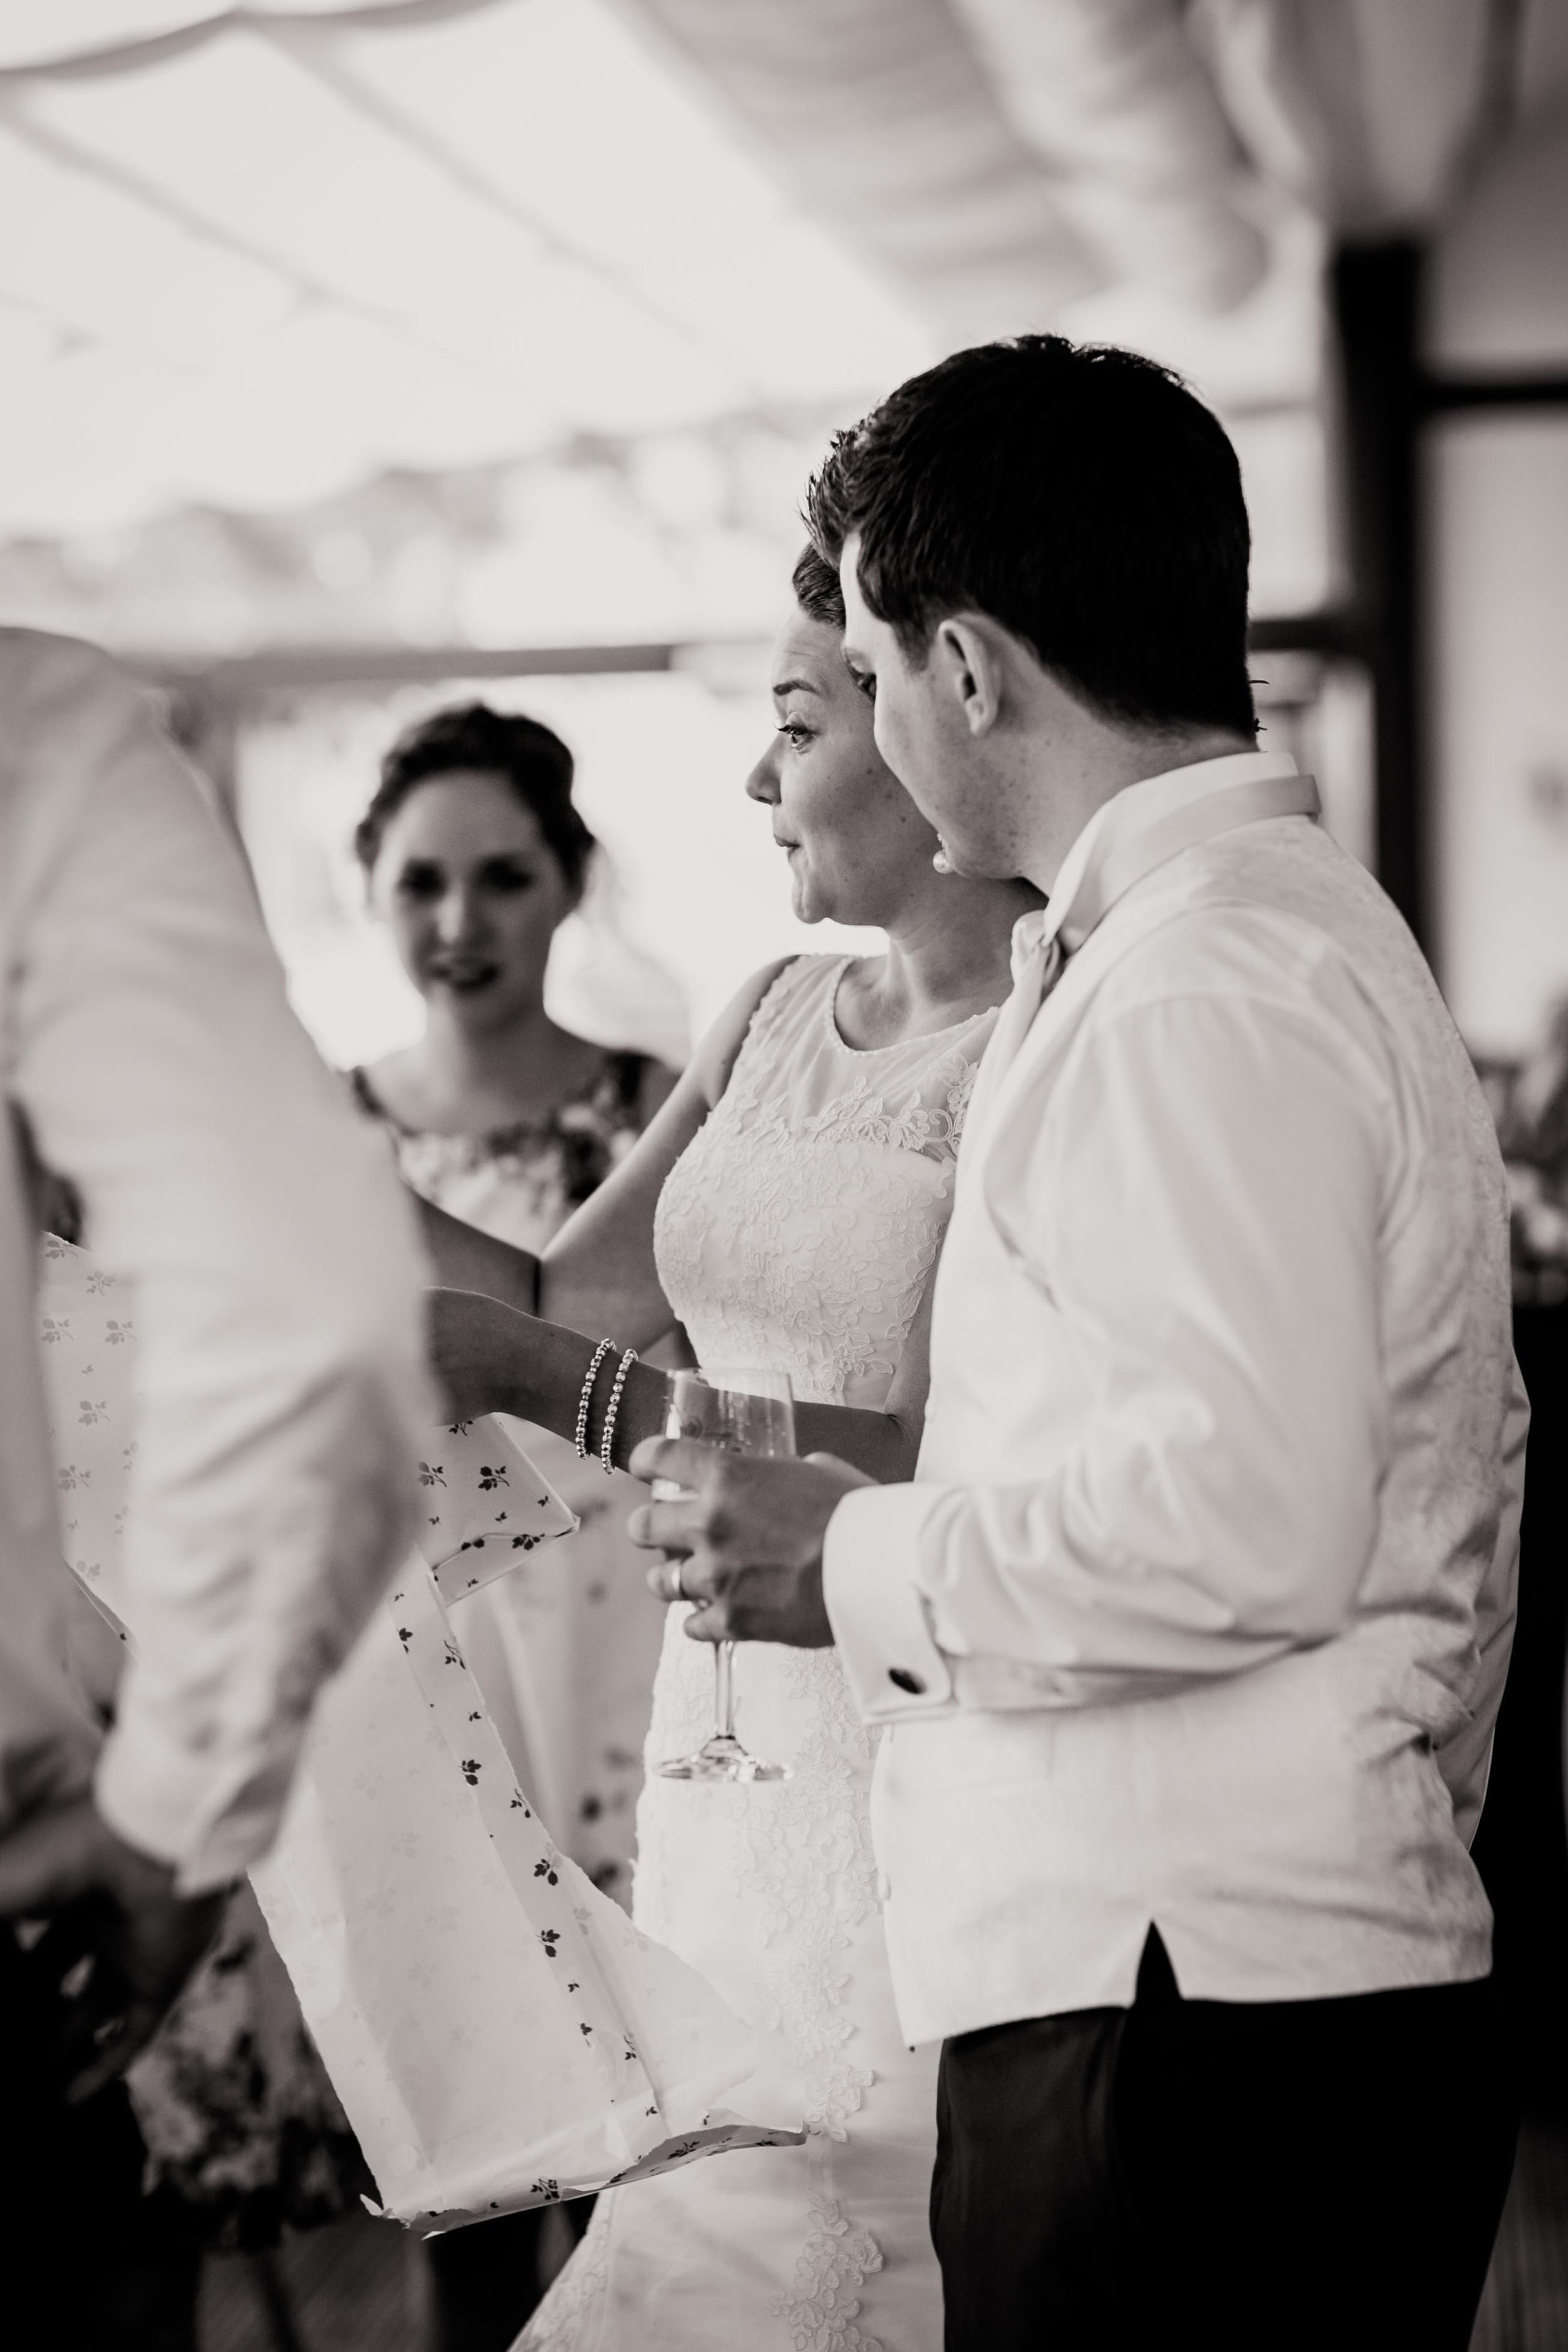 Hochzeitsfotografie Berlin_Fran Burrows Fotografie-297.jpg